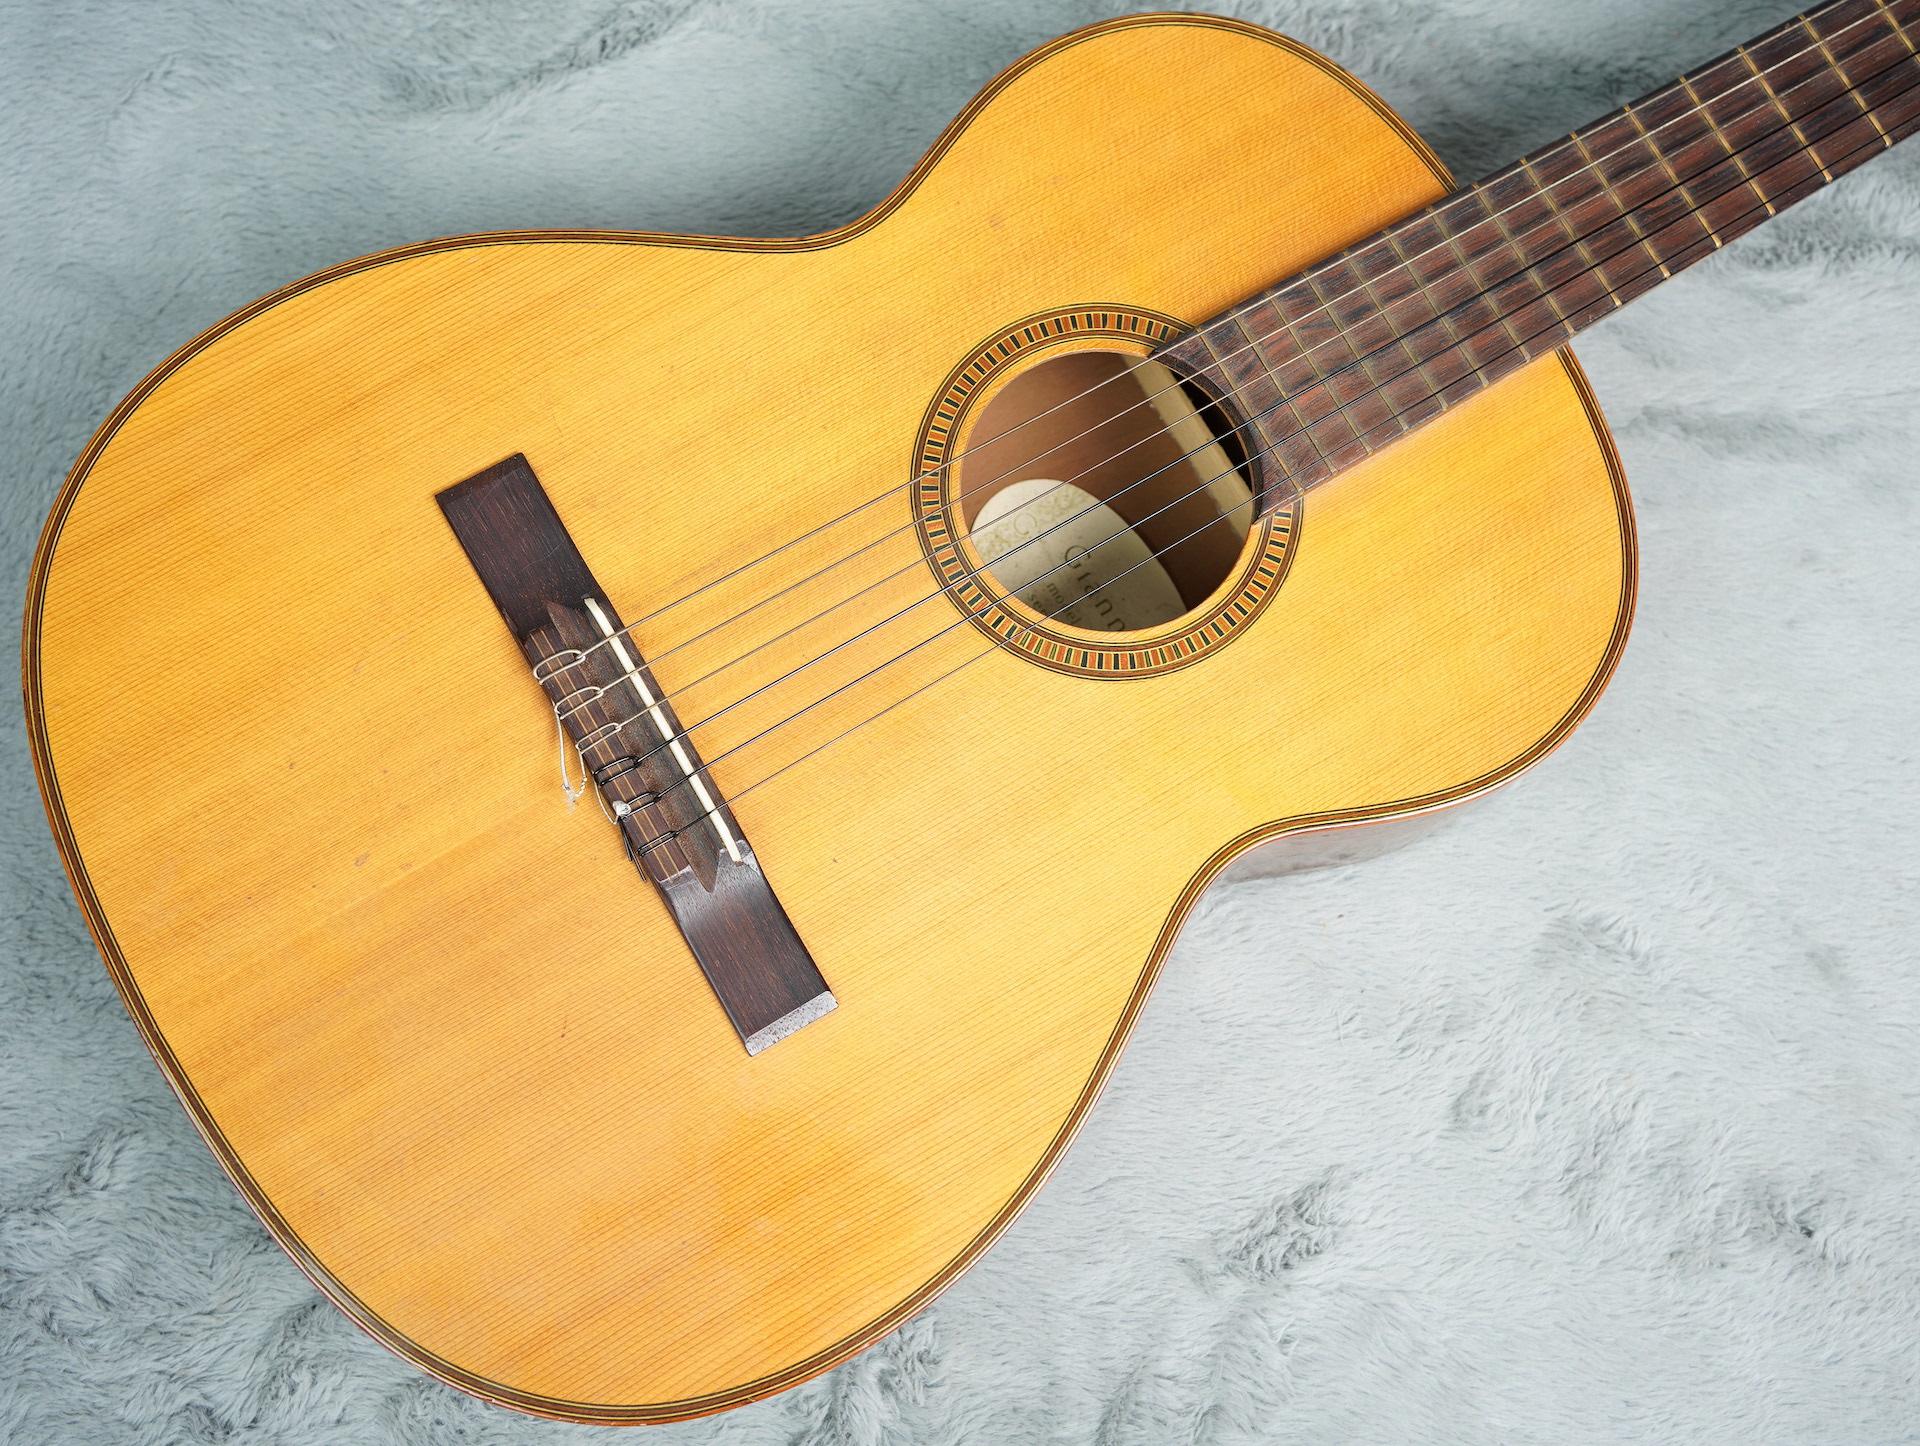 1972 Giannini GN-60 Classical Guitar